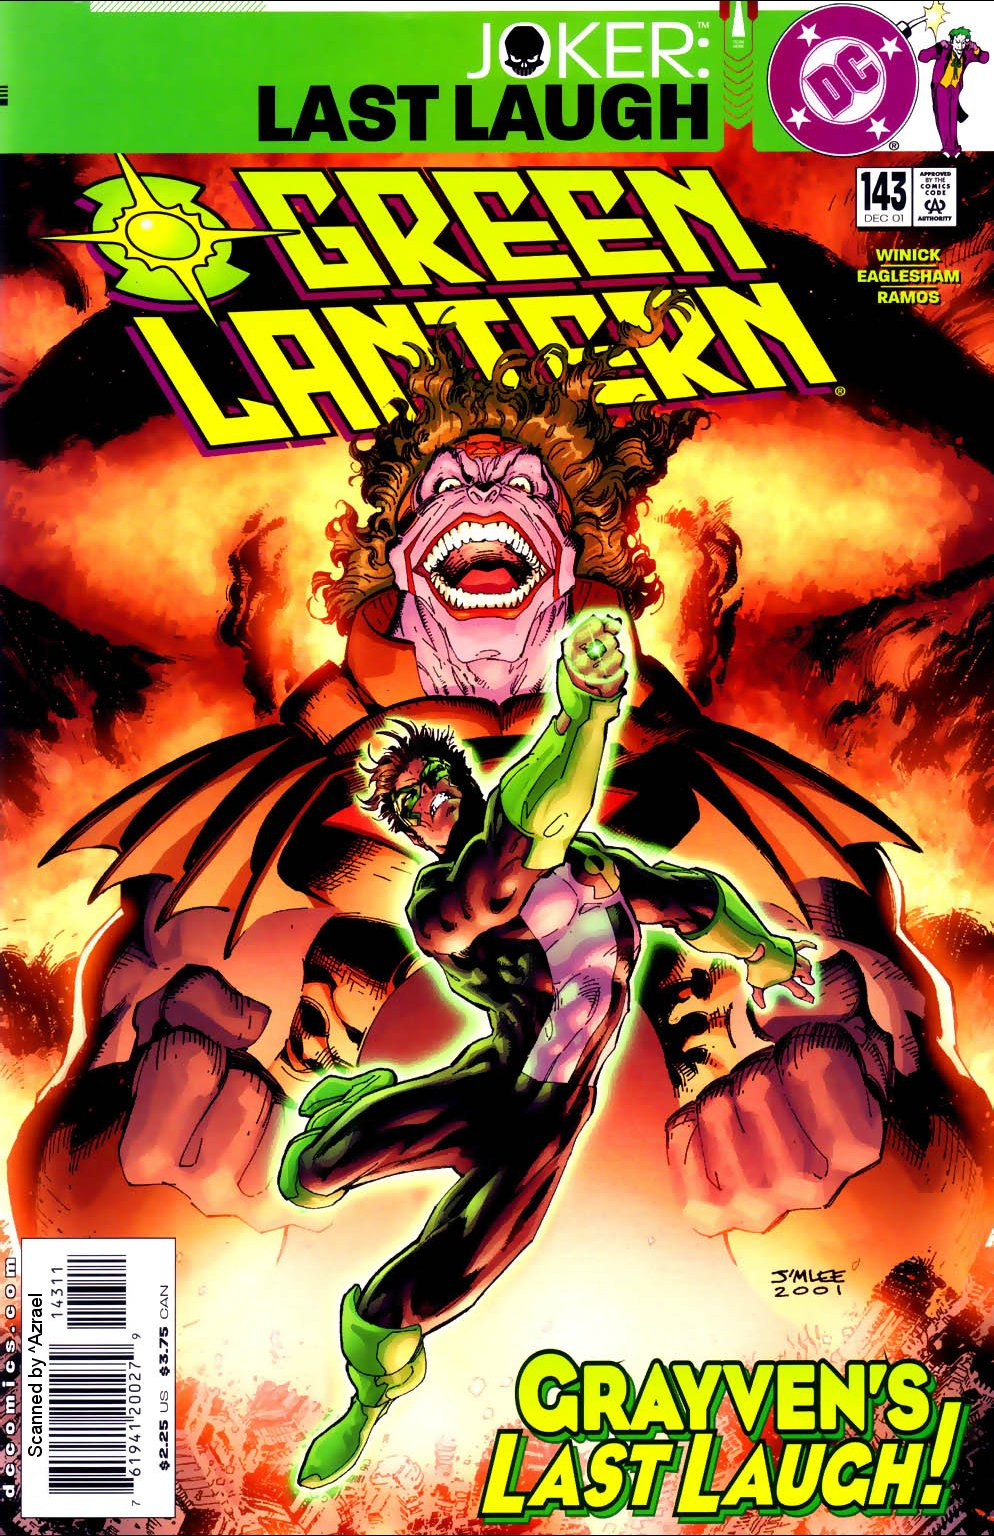 green_lantern_0143_00.jpg